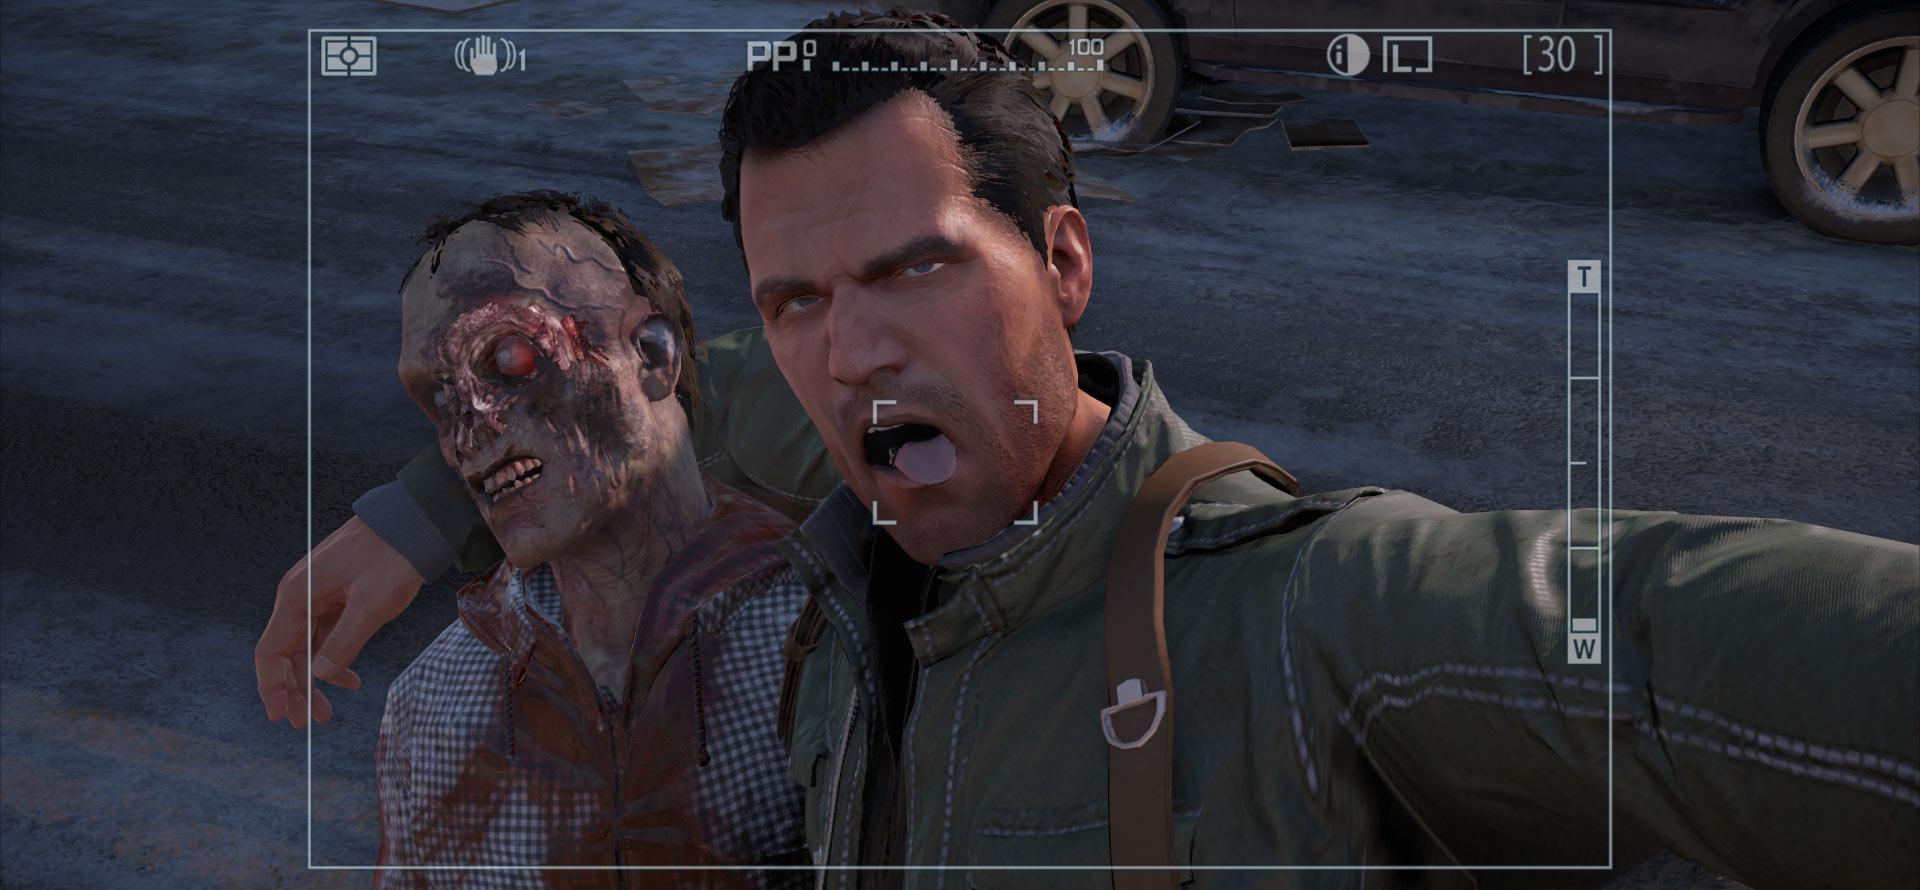 dead rising 2 slappy voice actor